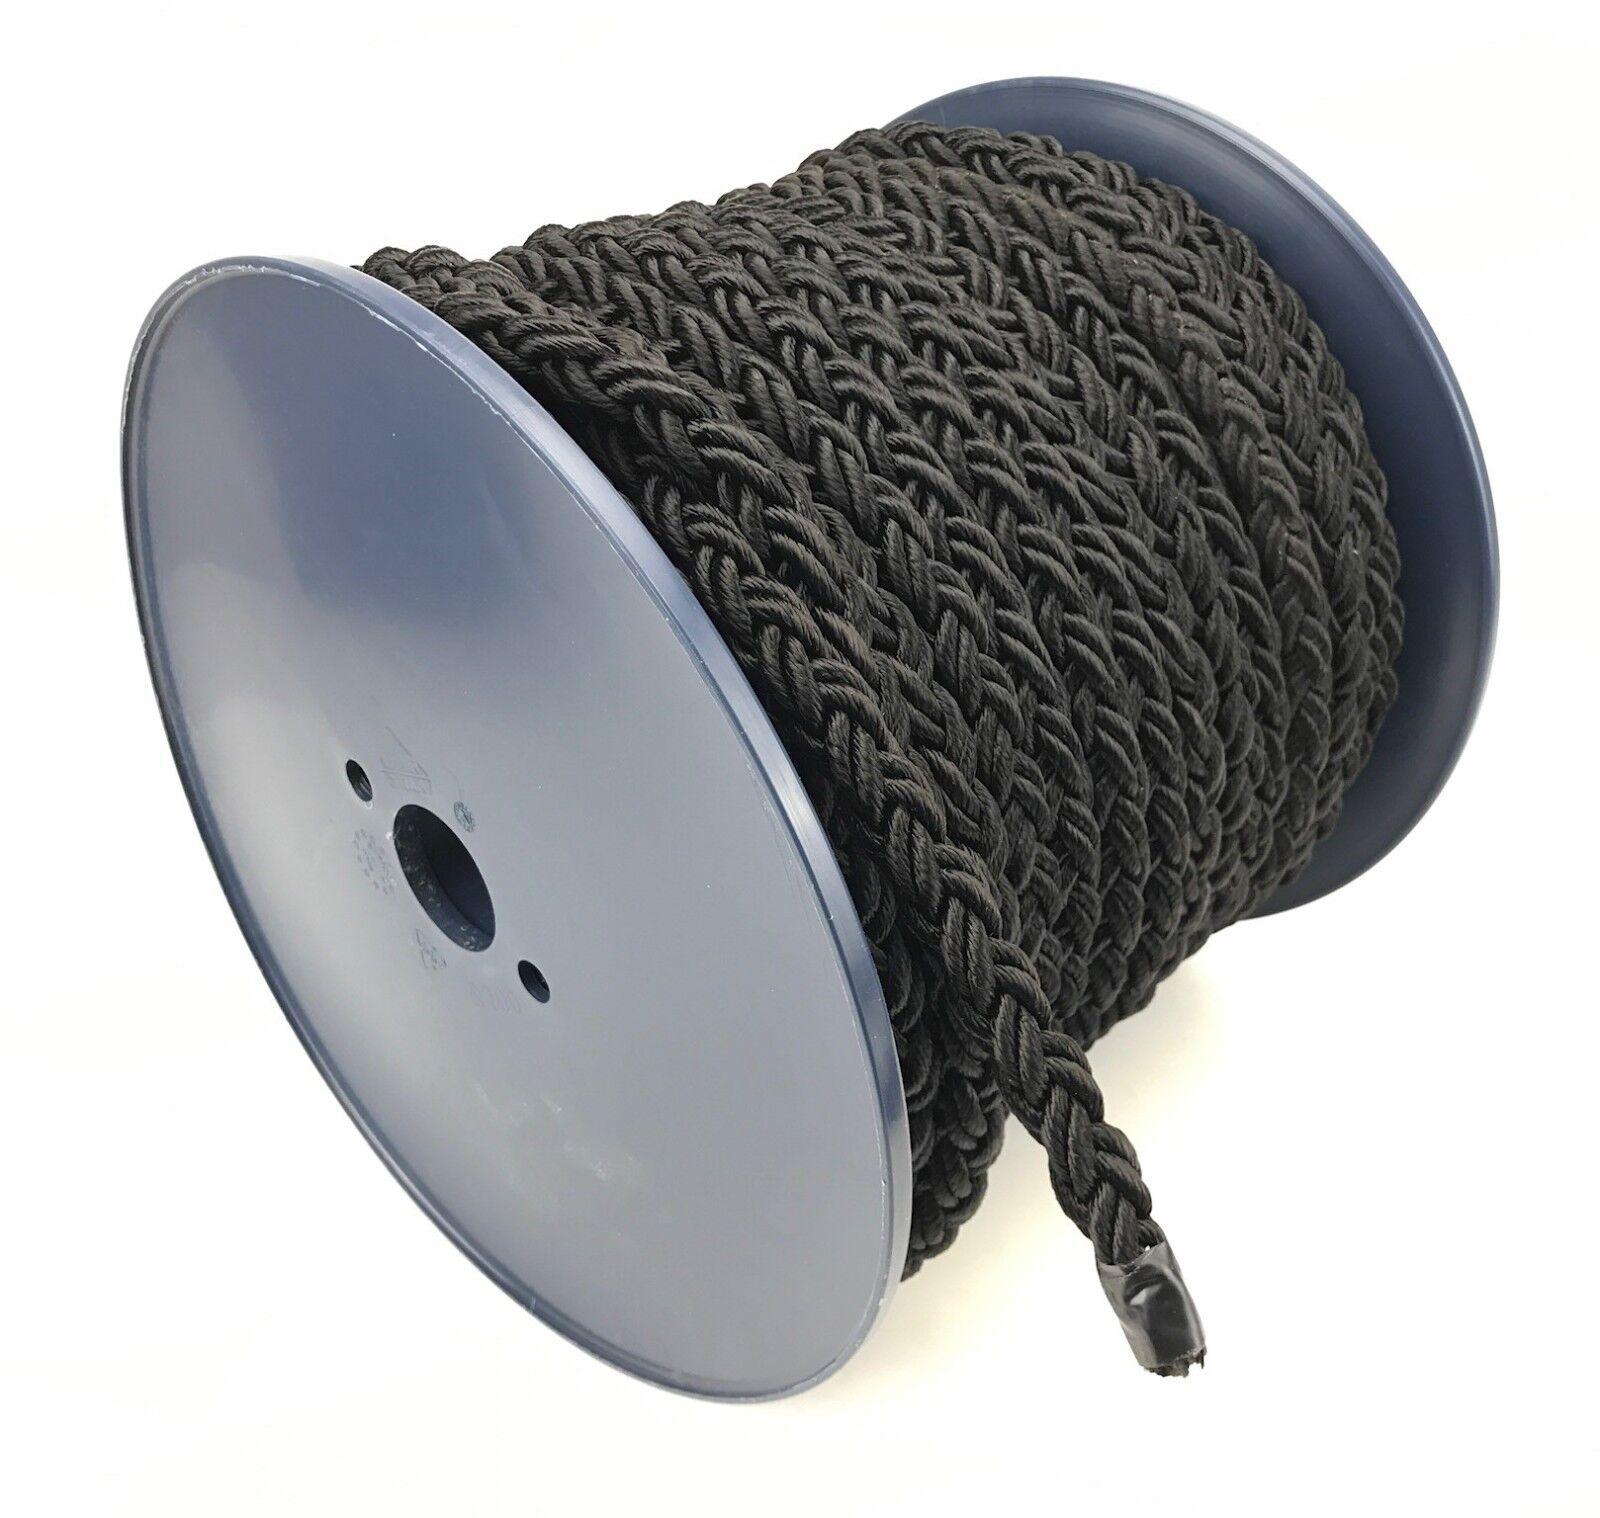 12mm 8 Strang schwarz Nylon Seil x 40 m m 40 Rolle, Liegeplatz Seil multiplait b9e9b5